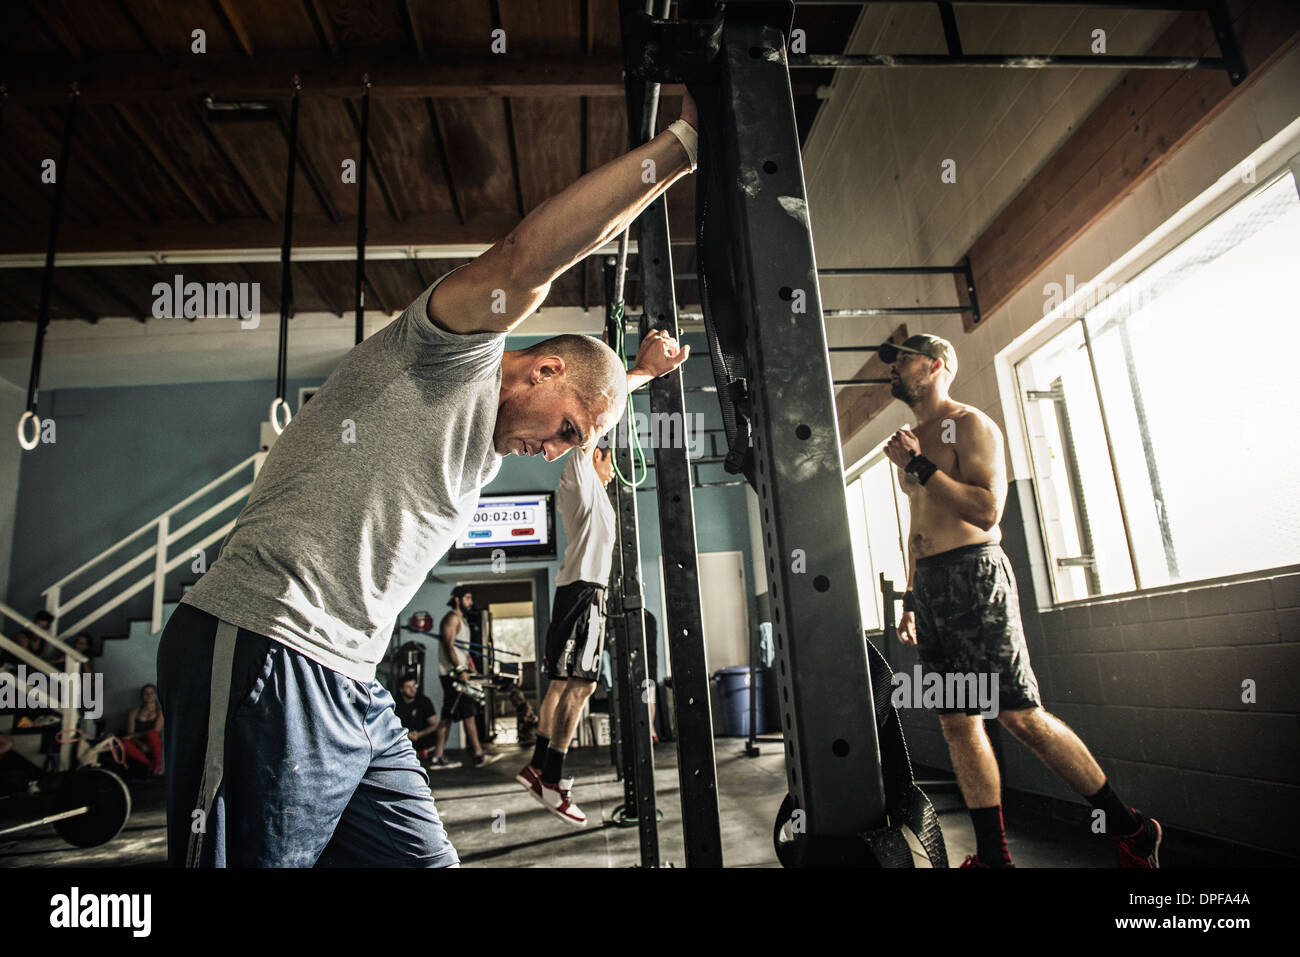 Men training on exercise bar in gymnasium - Stock Image